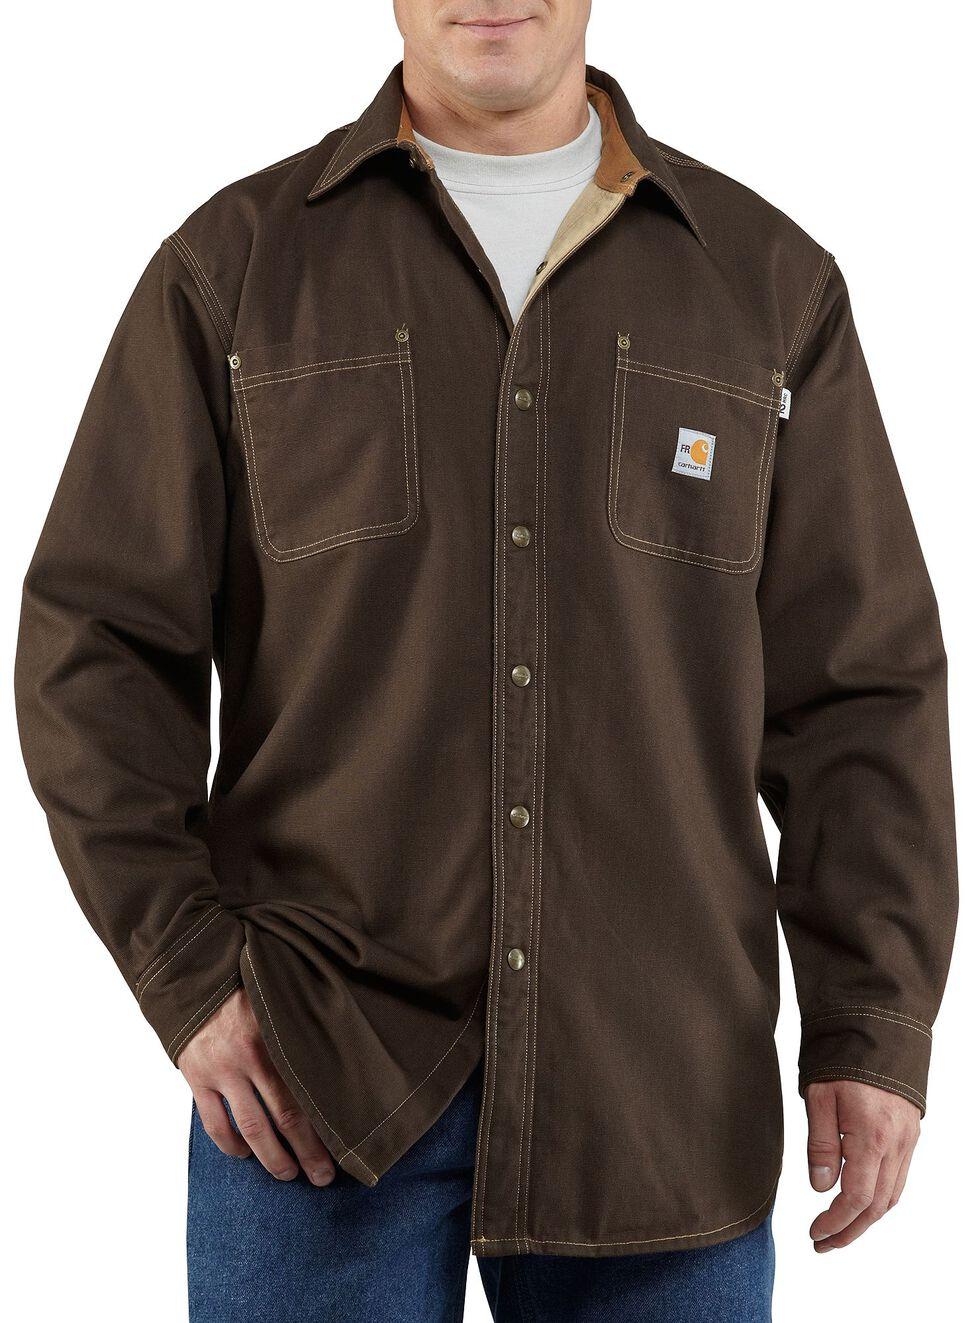 Carhartt Flame Resistant Canvas Shirt Jacket - Big & Tall, Dark Brown, hi-res